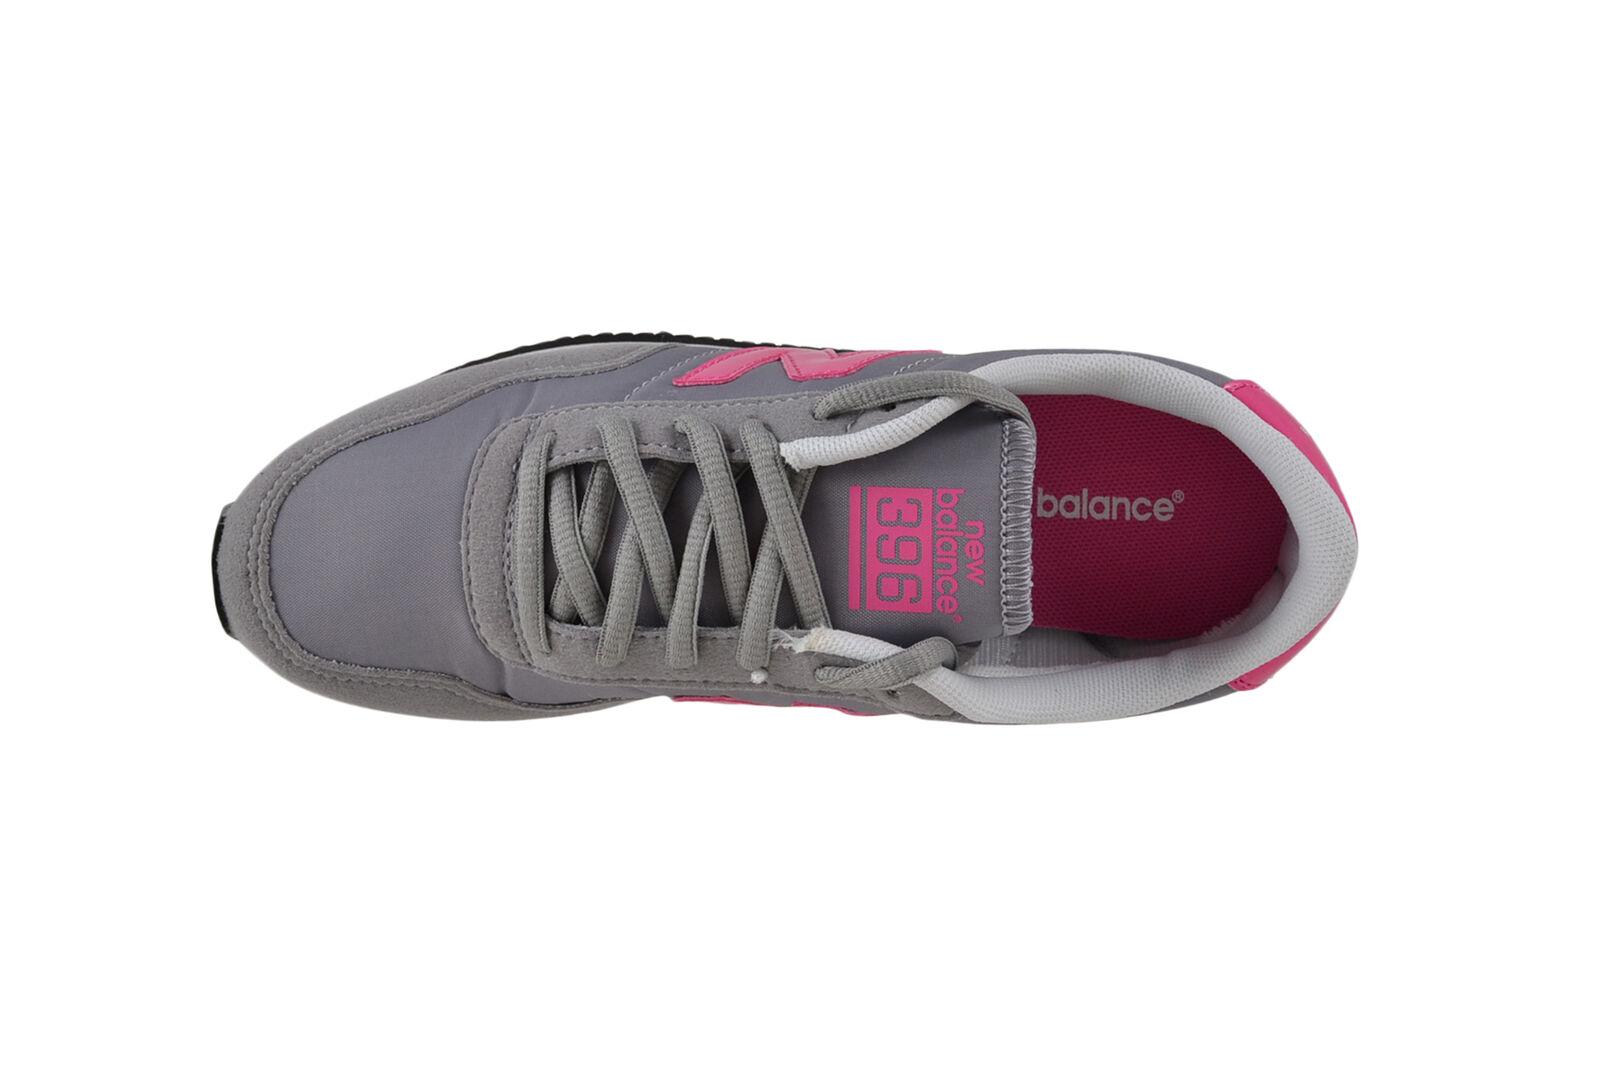 New Balance U396 BF grau Schuhe Schuhe Schuhe Turnschuhe grau Rosa U396BF 5fd8a3